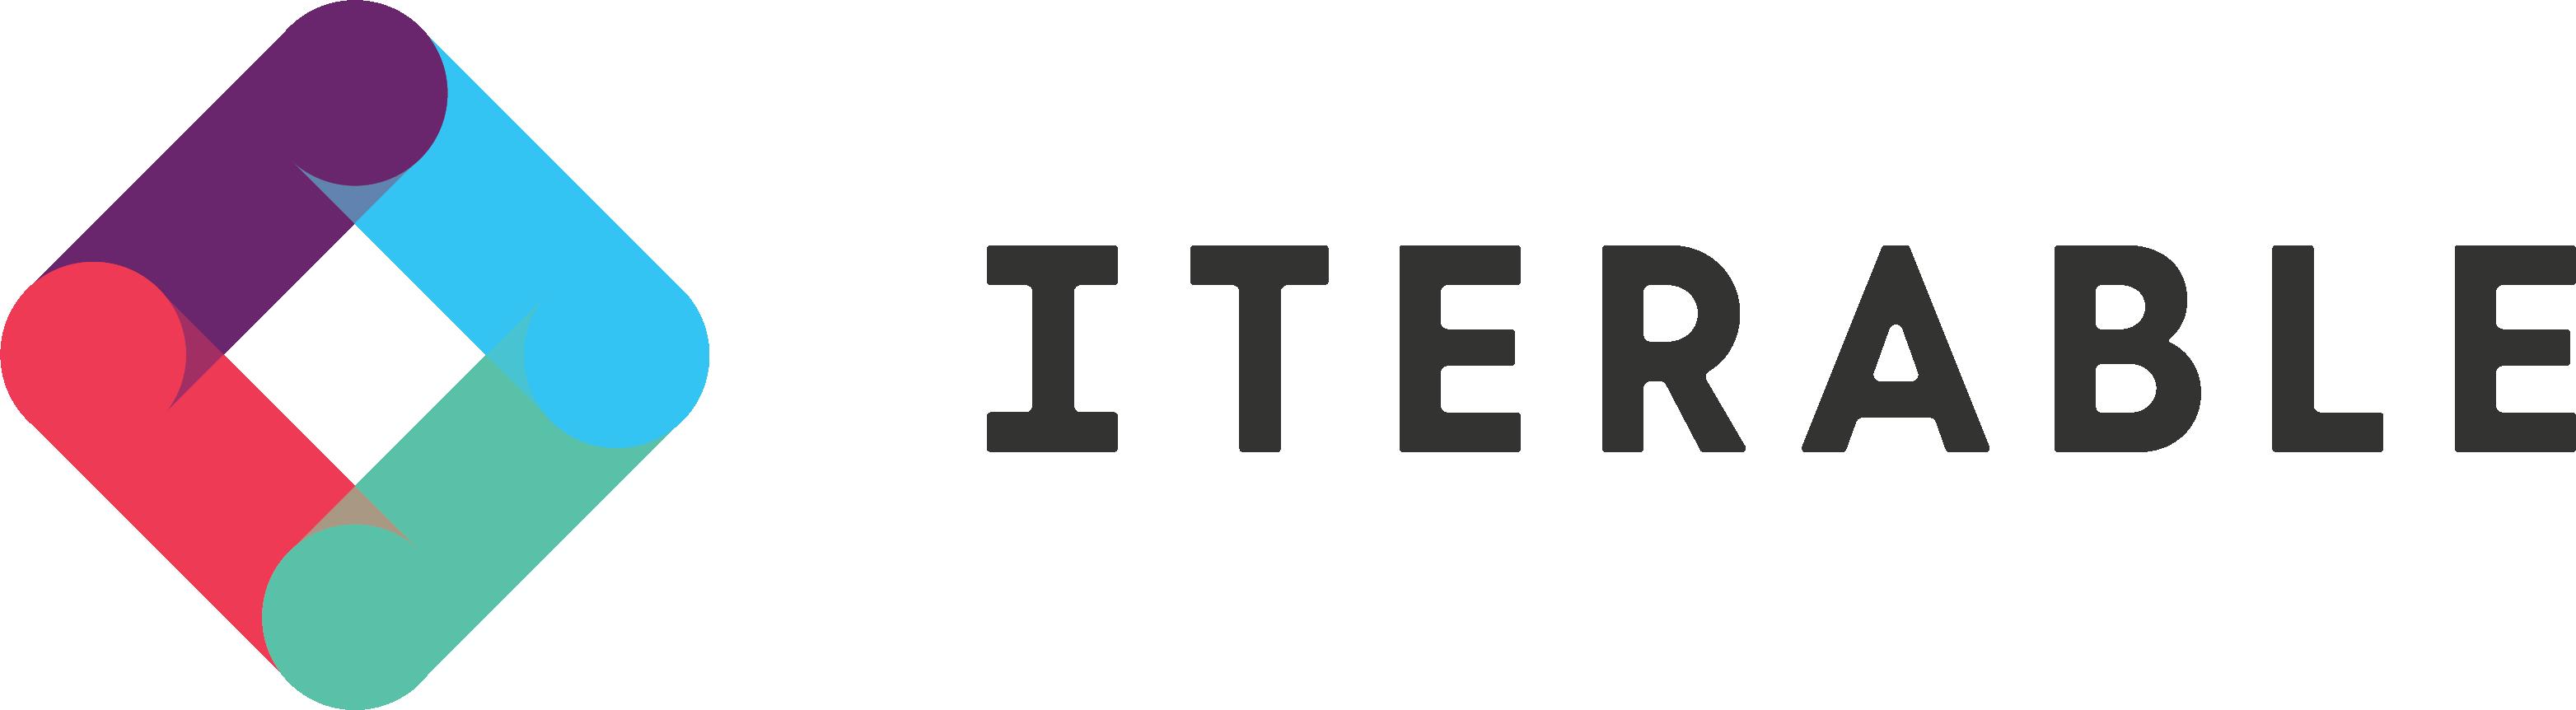 iterable-diamond-logo-3127x862-1